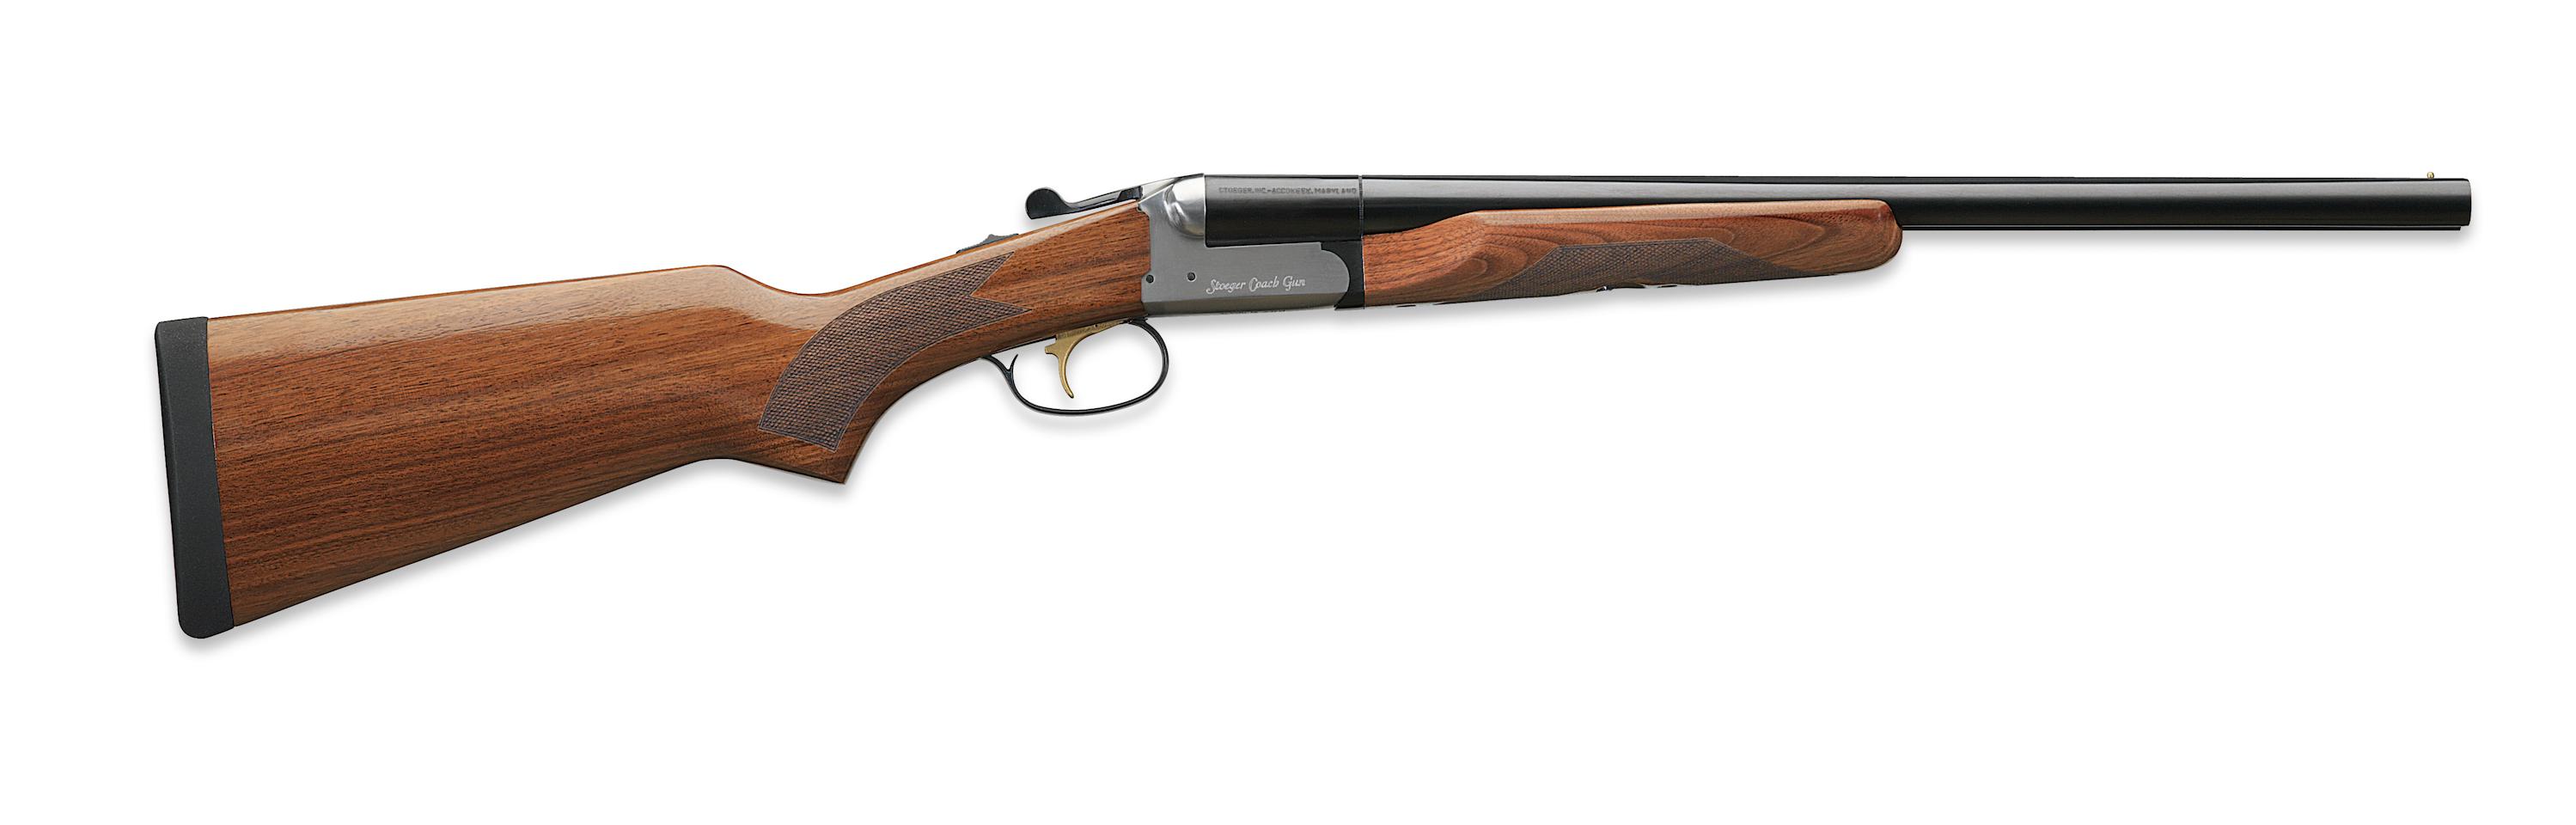 Drawn shotgun cowboy gun Gun Shooting Stoeger Gun Coach